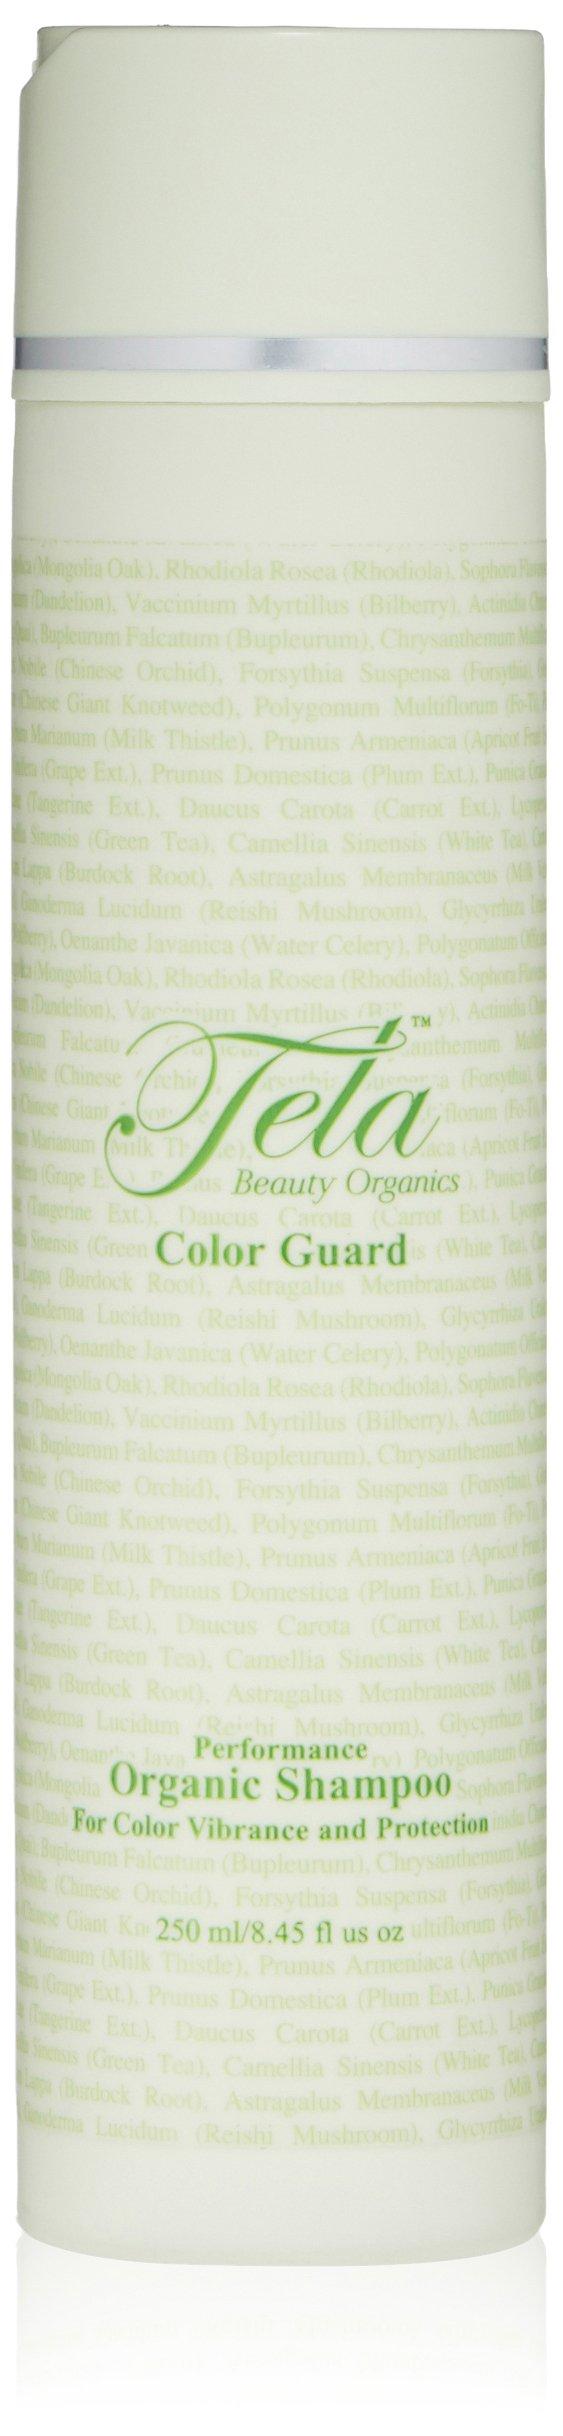 Tela Beauty Organics Balance Conditioner, Lavender, 8.45 oz.